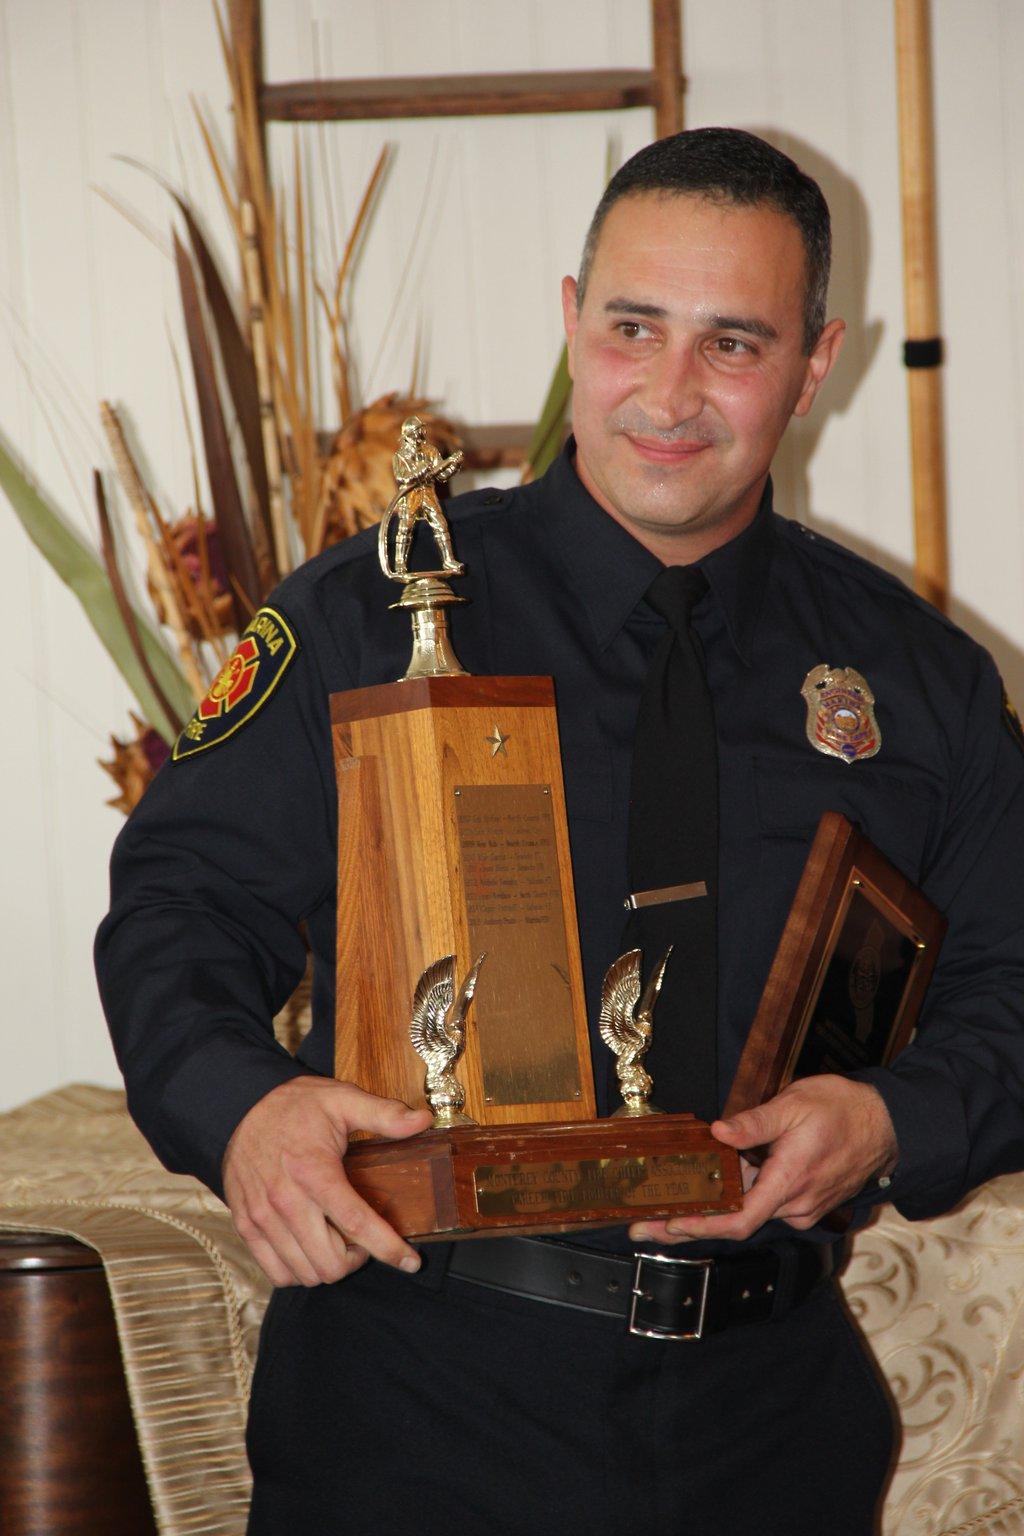 Anthony Prado with award